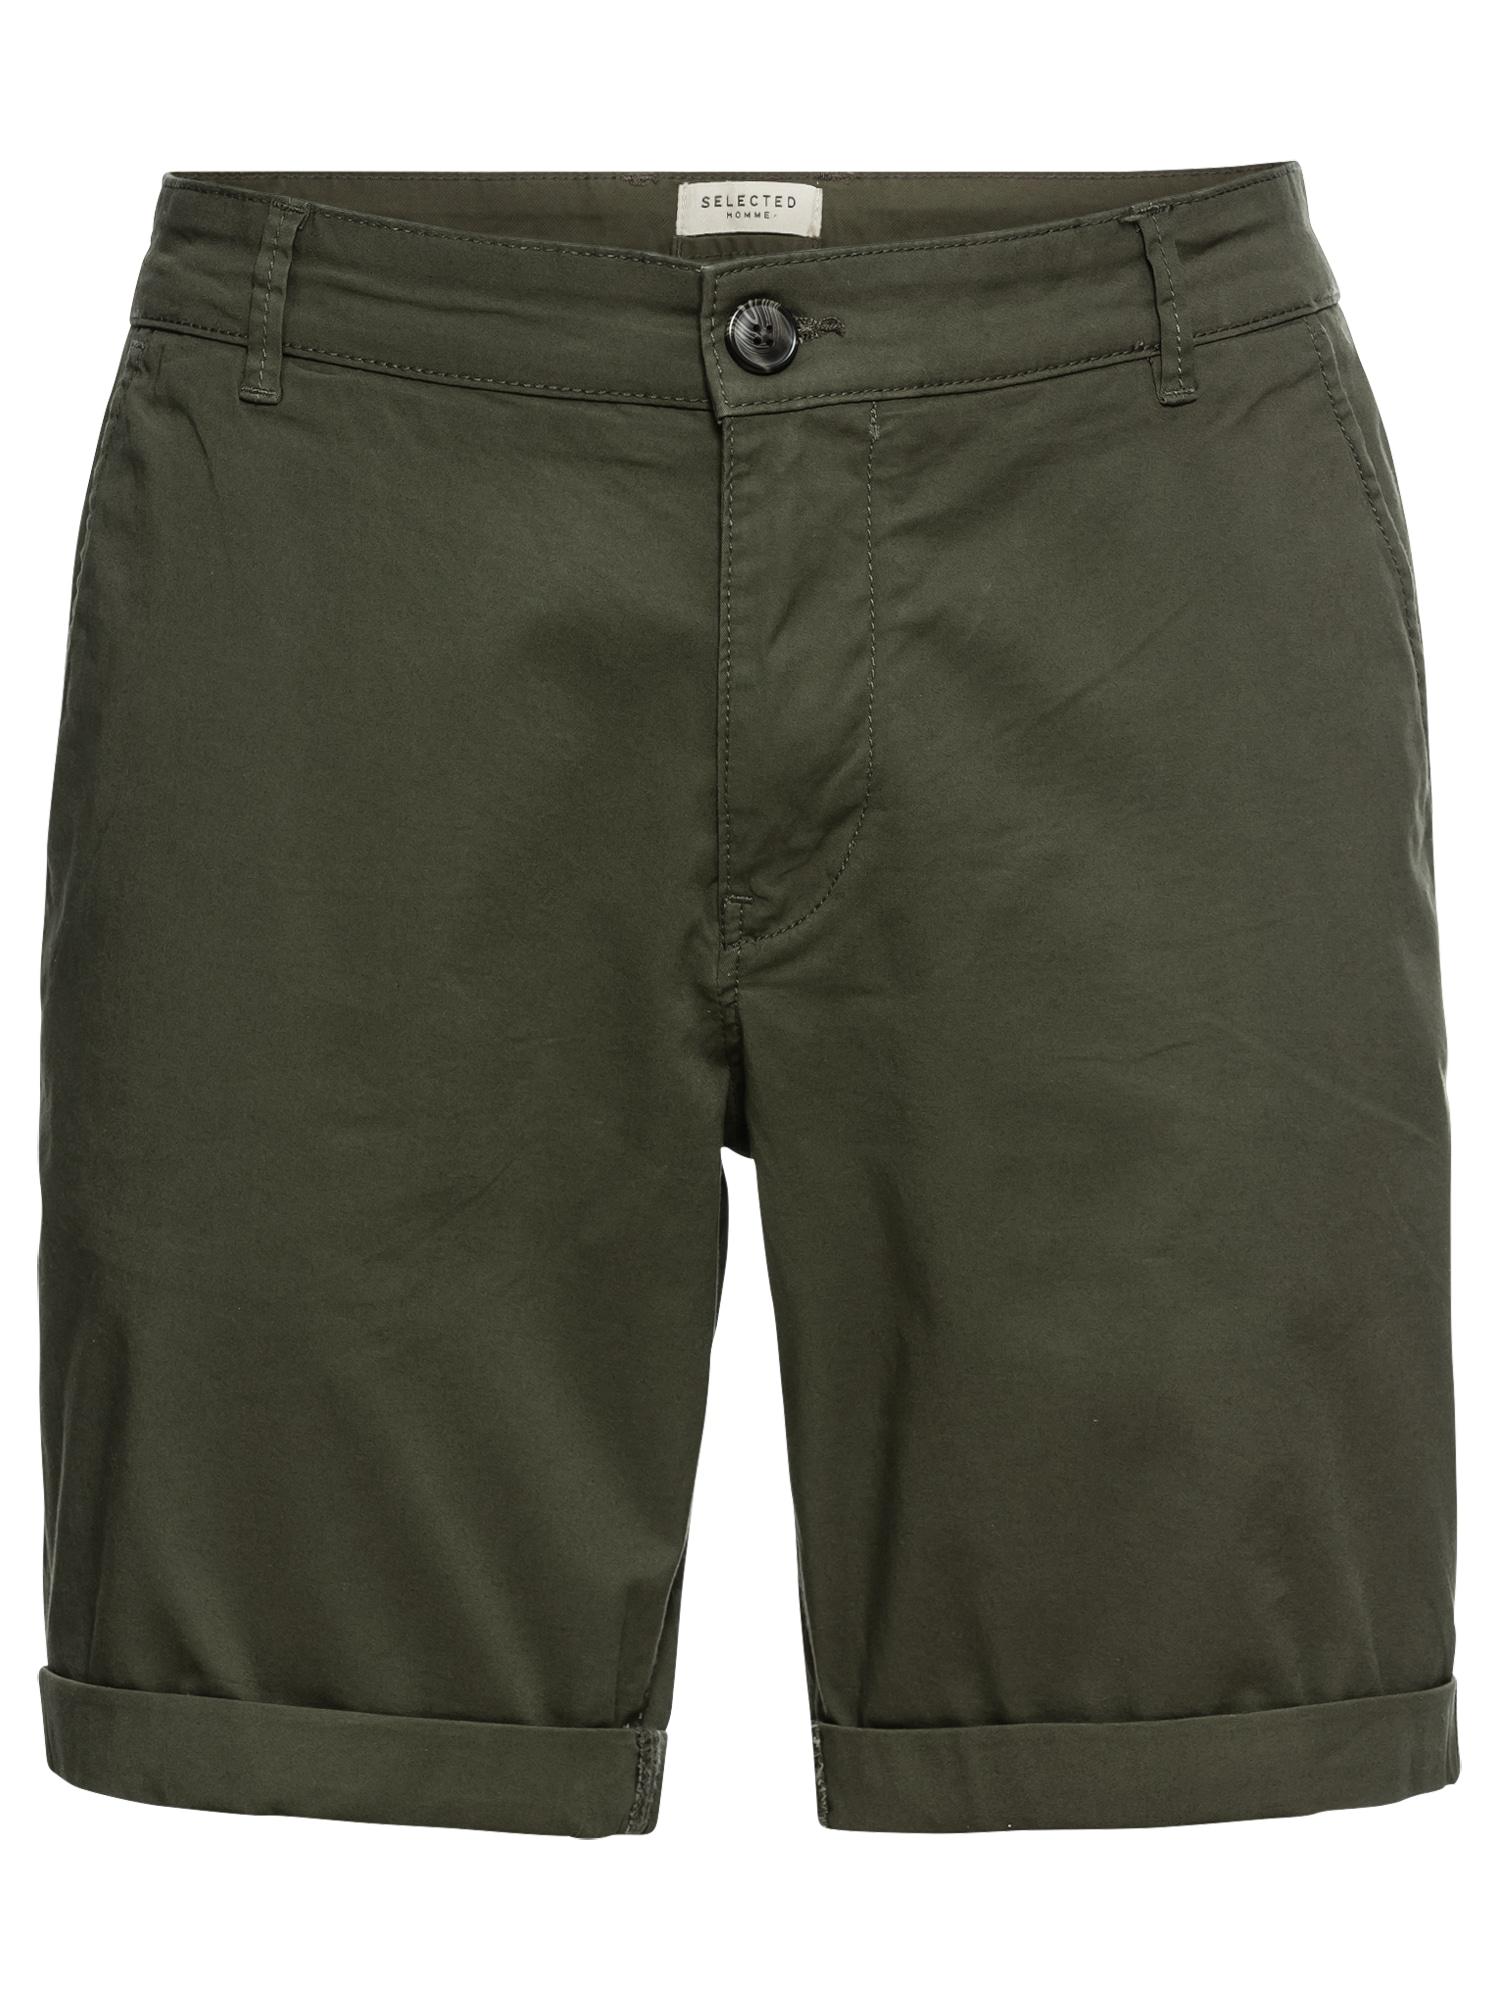 SELECTED HOMME Kelnės tamsiai žalia